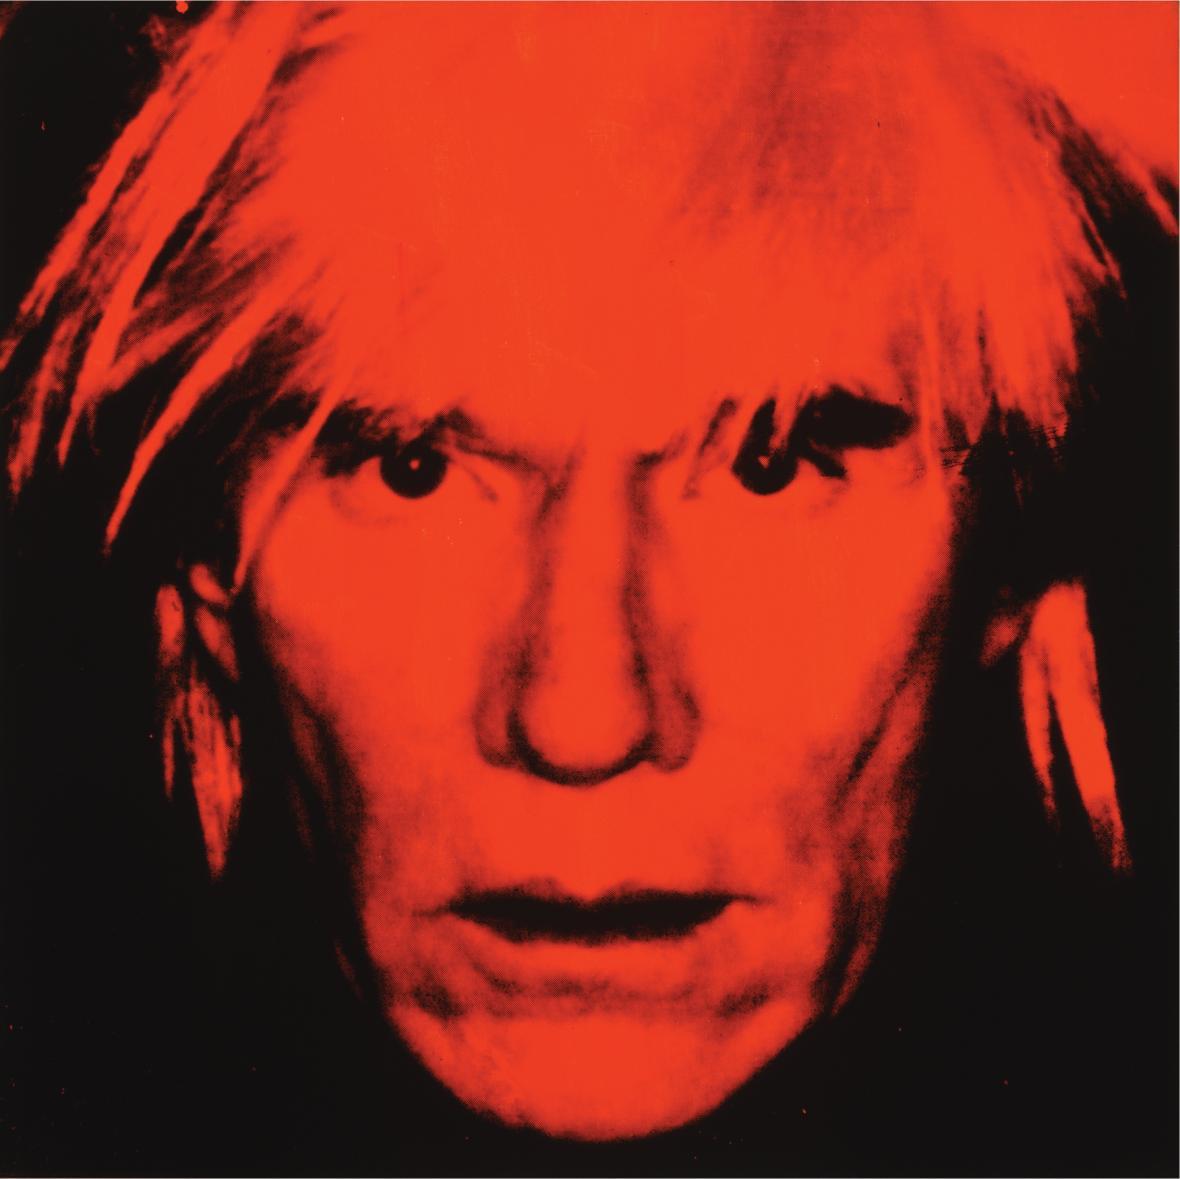 Autoportrét Andyho Warhola